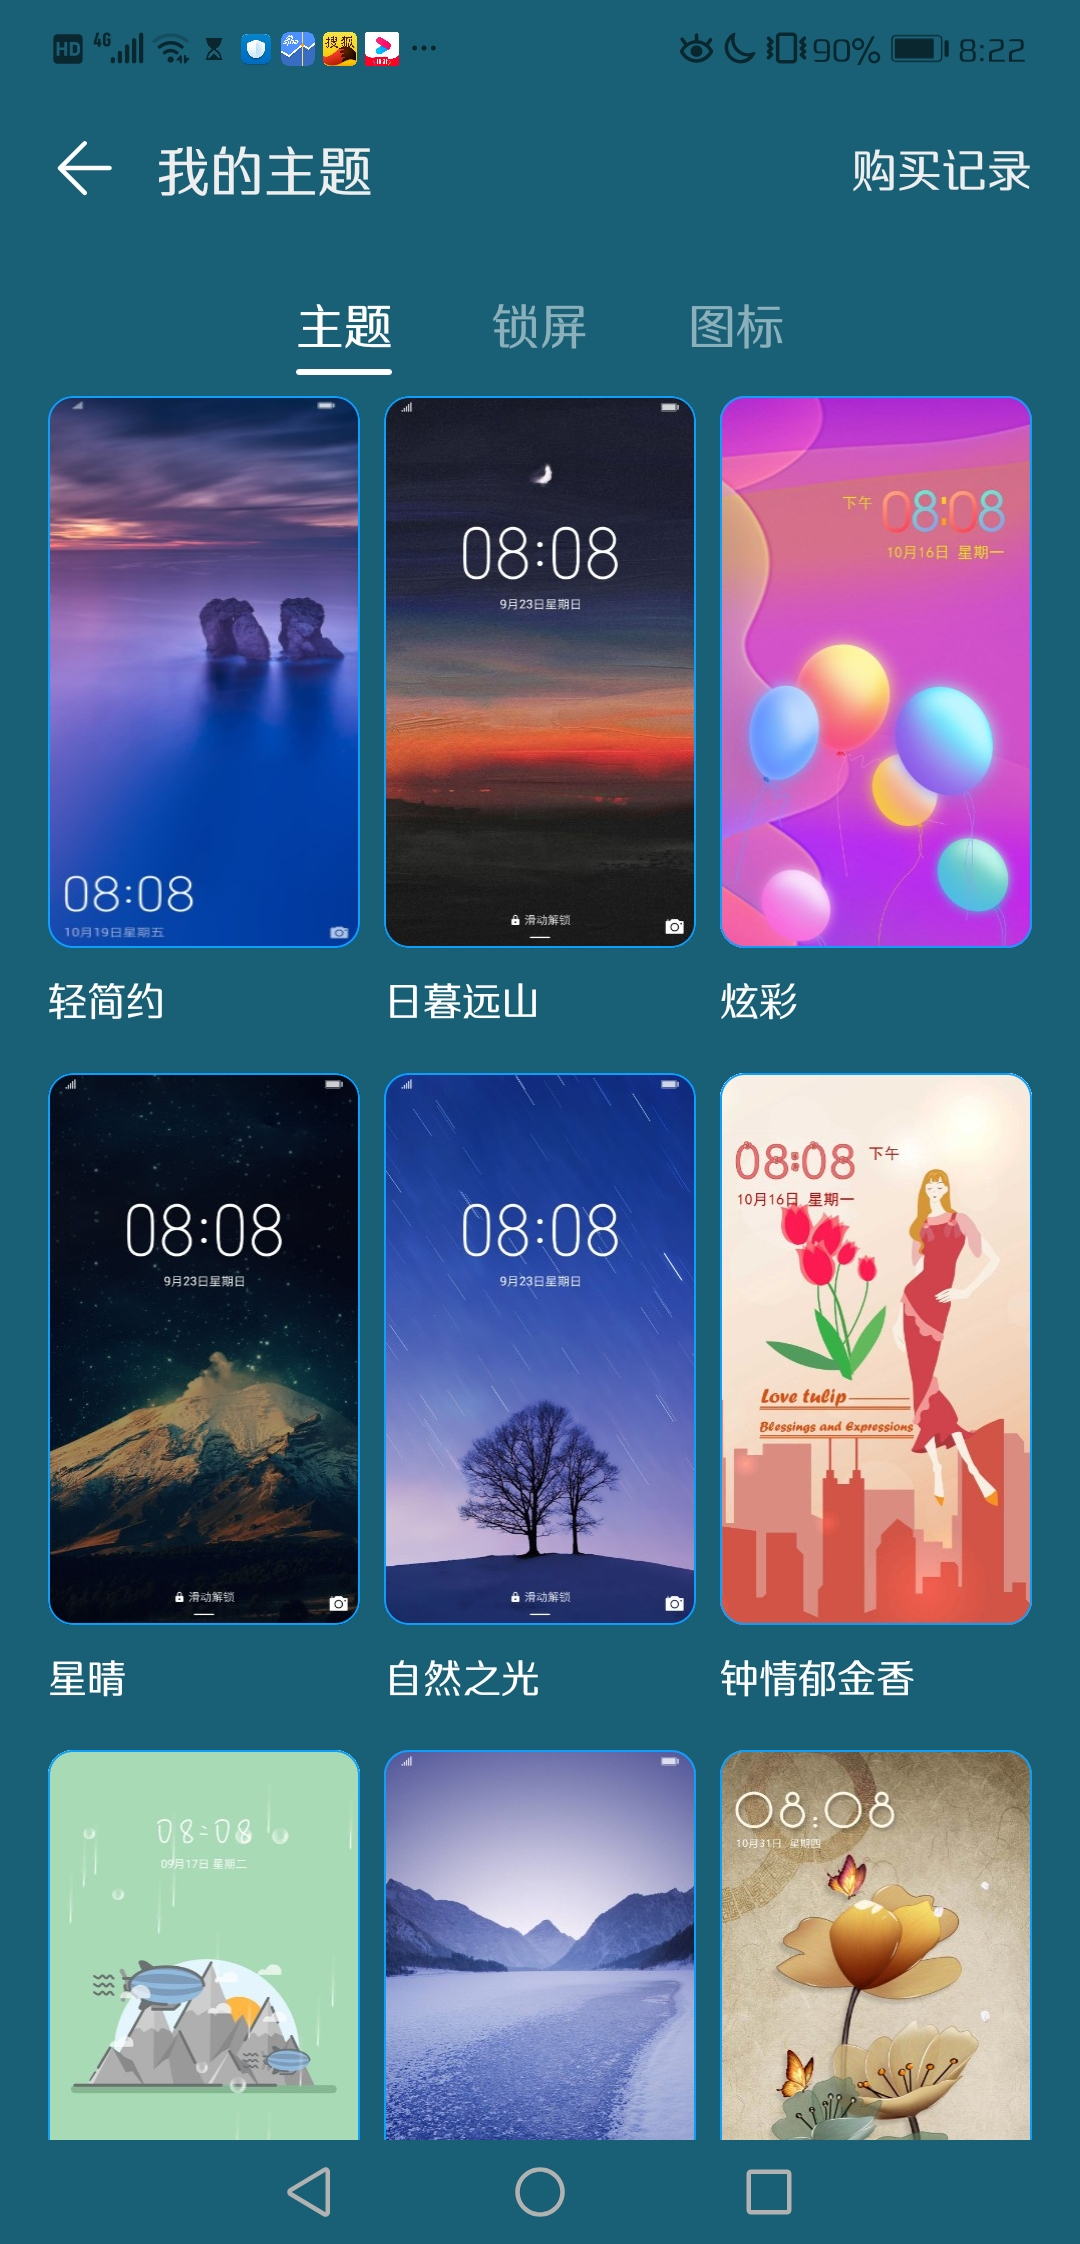 Screenshot_20191115_082230_com.huawei.android.thememanager.jpg